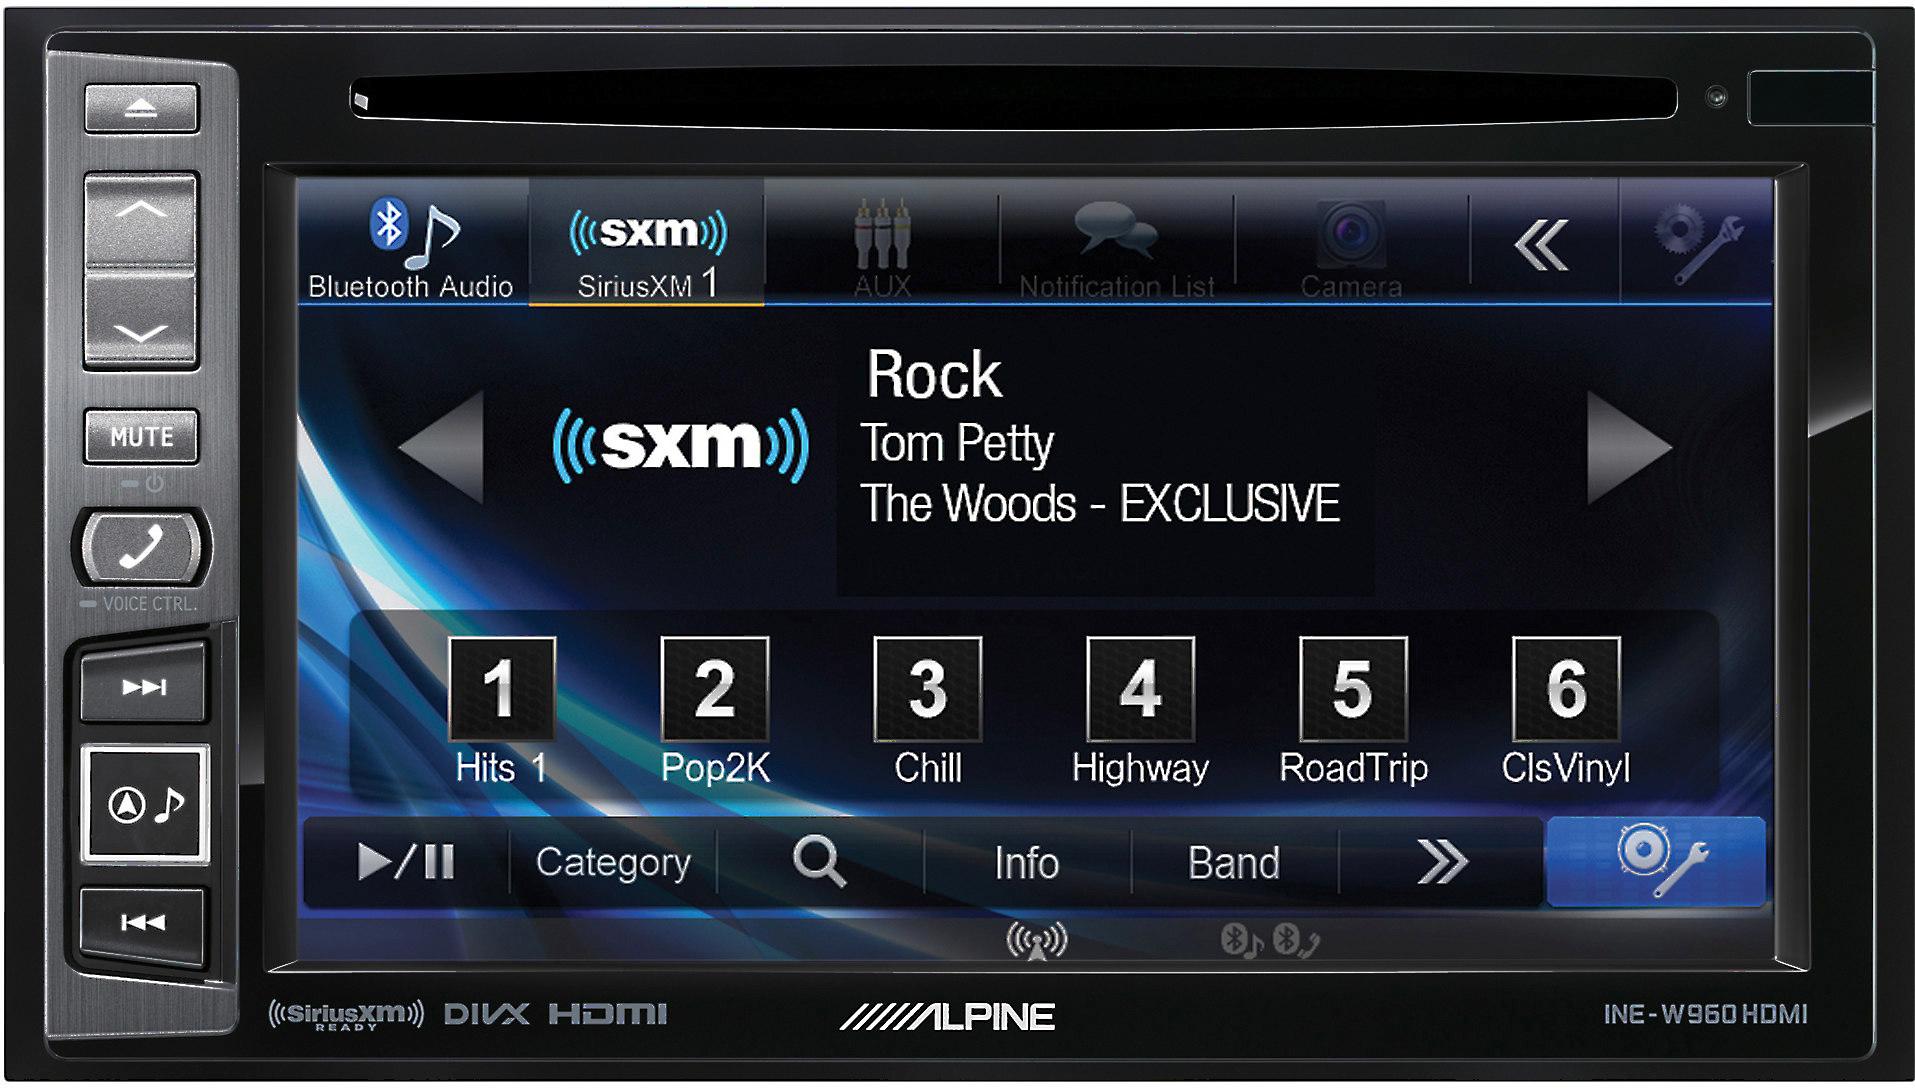 ec4a0d500 Alpine INE-W960HDMI Navigation receiver with free SiriusXM Satellite Radio  tuner at Crutchfield.com